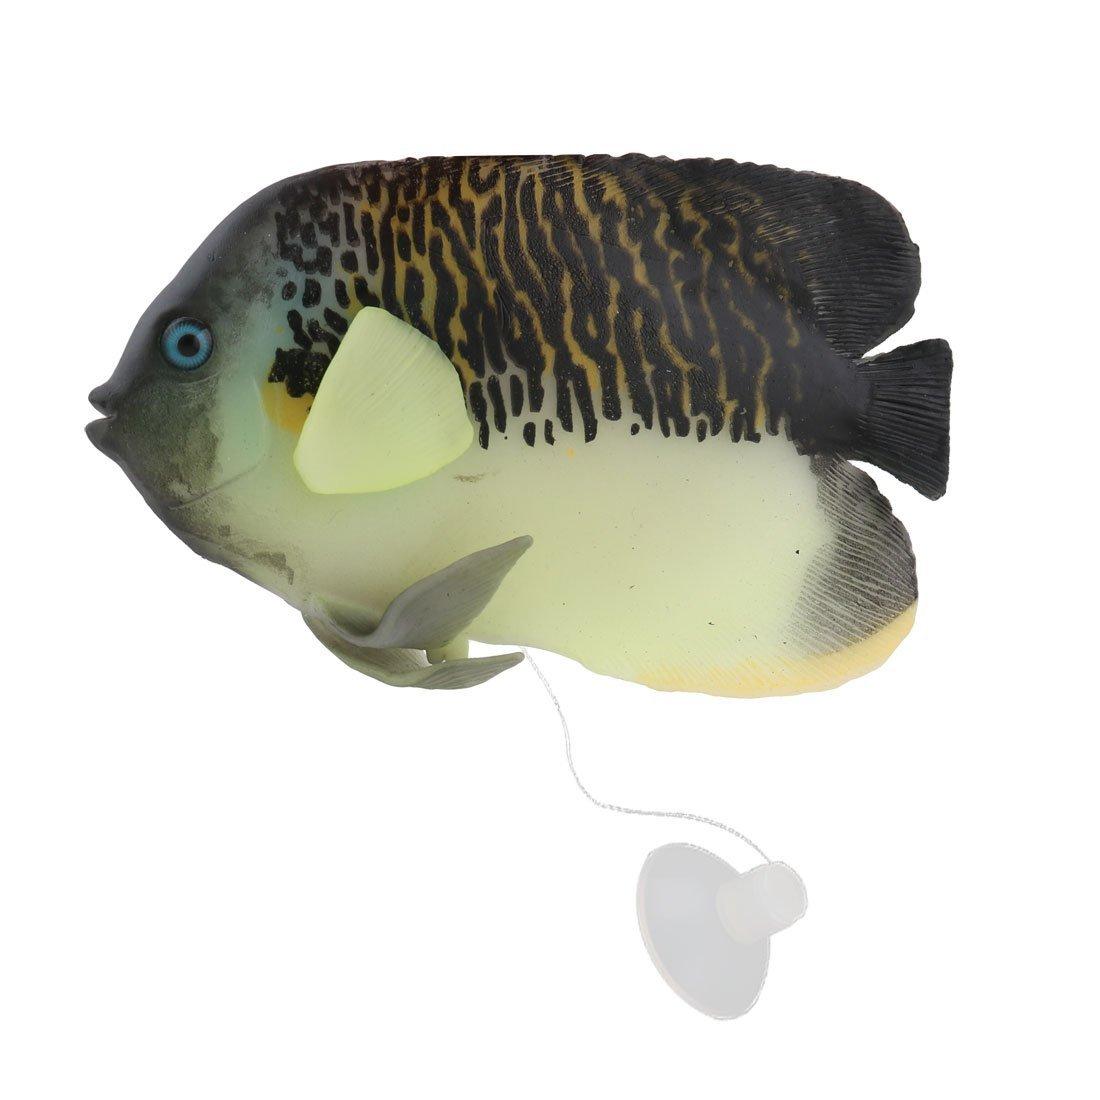 1Pc Silicone Aquarium Aquatic Emulational Imitation Butterflyfish Ornament